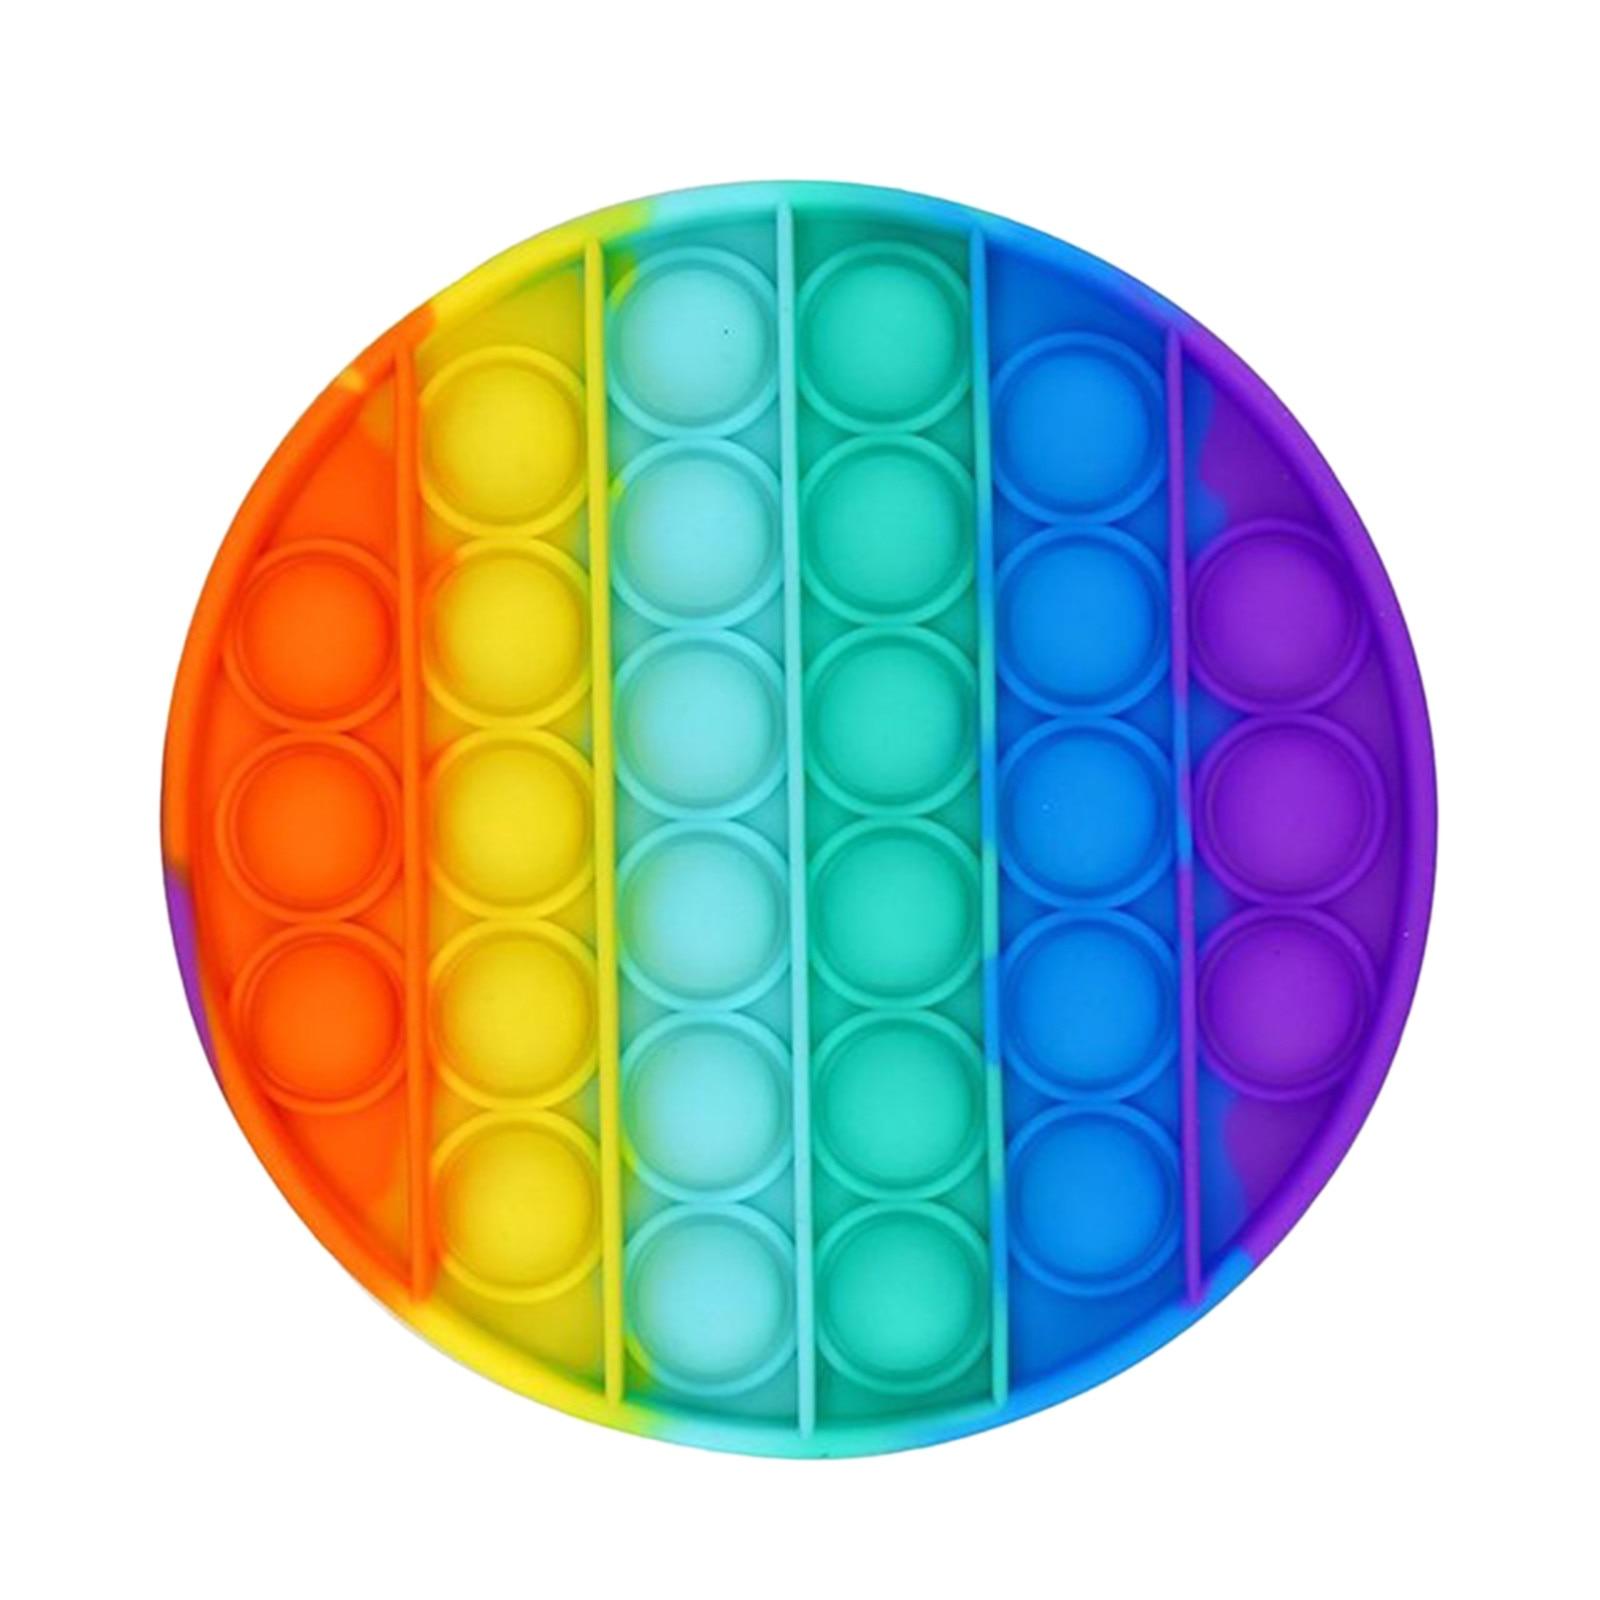 Adult Toys Autism Fidget Needs Rainbow Bubble-Sensory Anti-Stress Squishy Pop-It Push-Pops img1